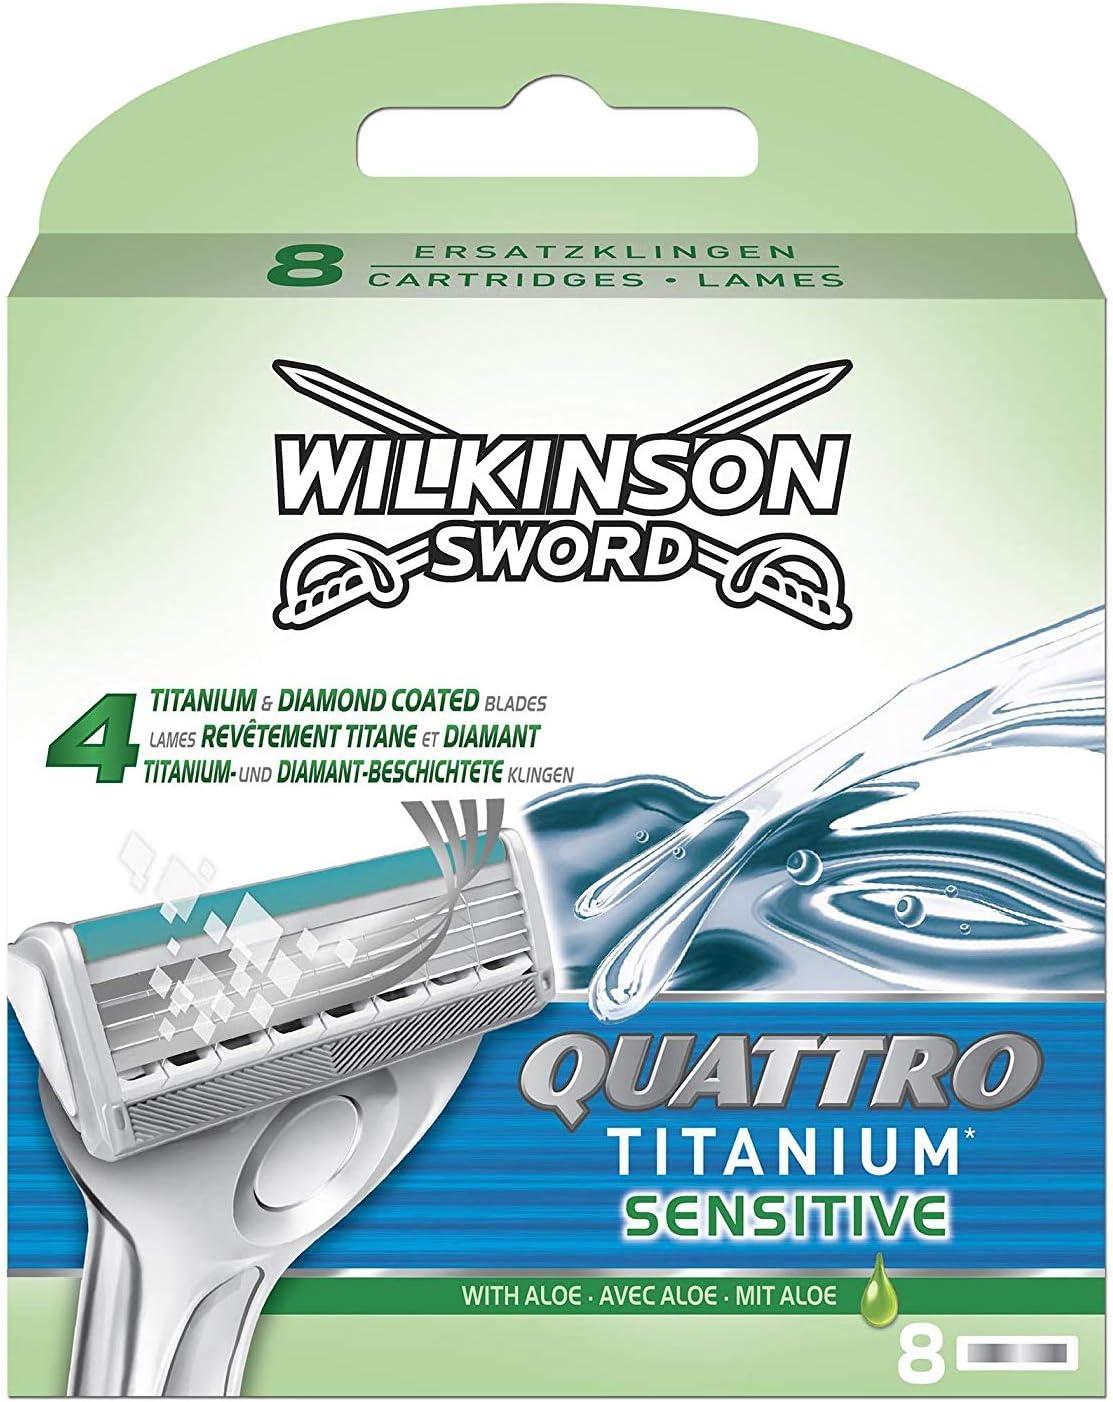 Wilkinson Sword Quattro Titanium - Cargador de 8 Recambios de Cuchillas de Afeitar para Hombre de 4 Hojas de Titanio, Afeitado Manual Masculino